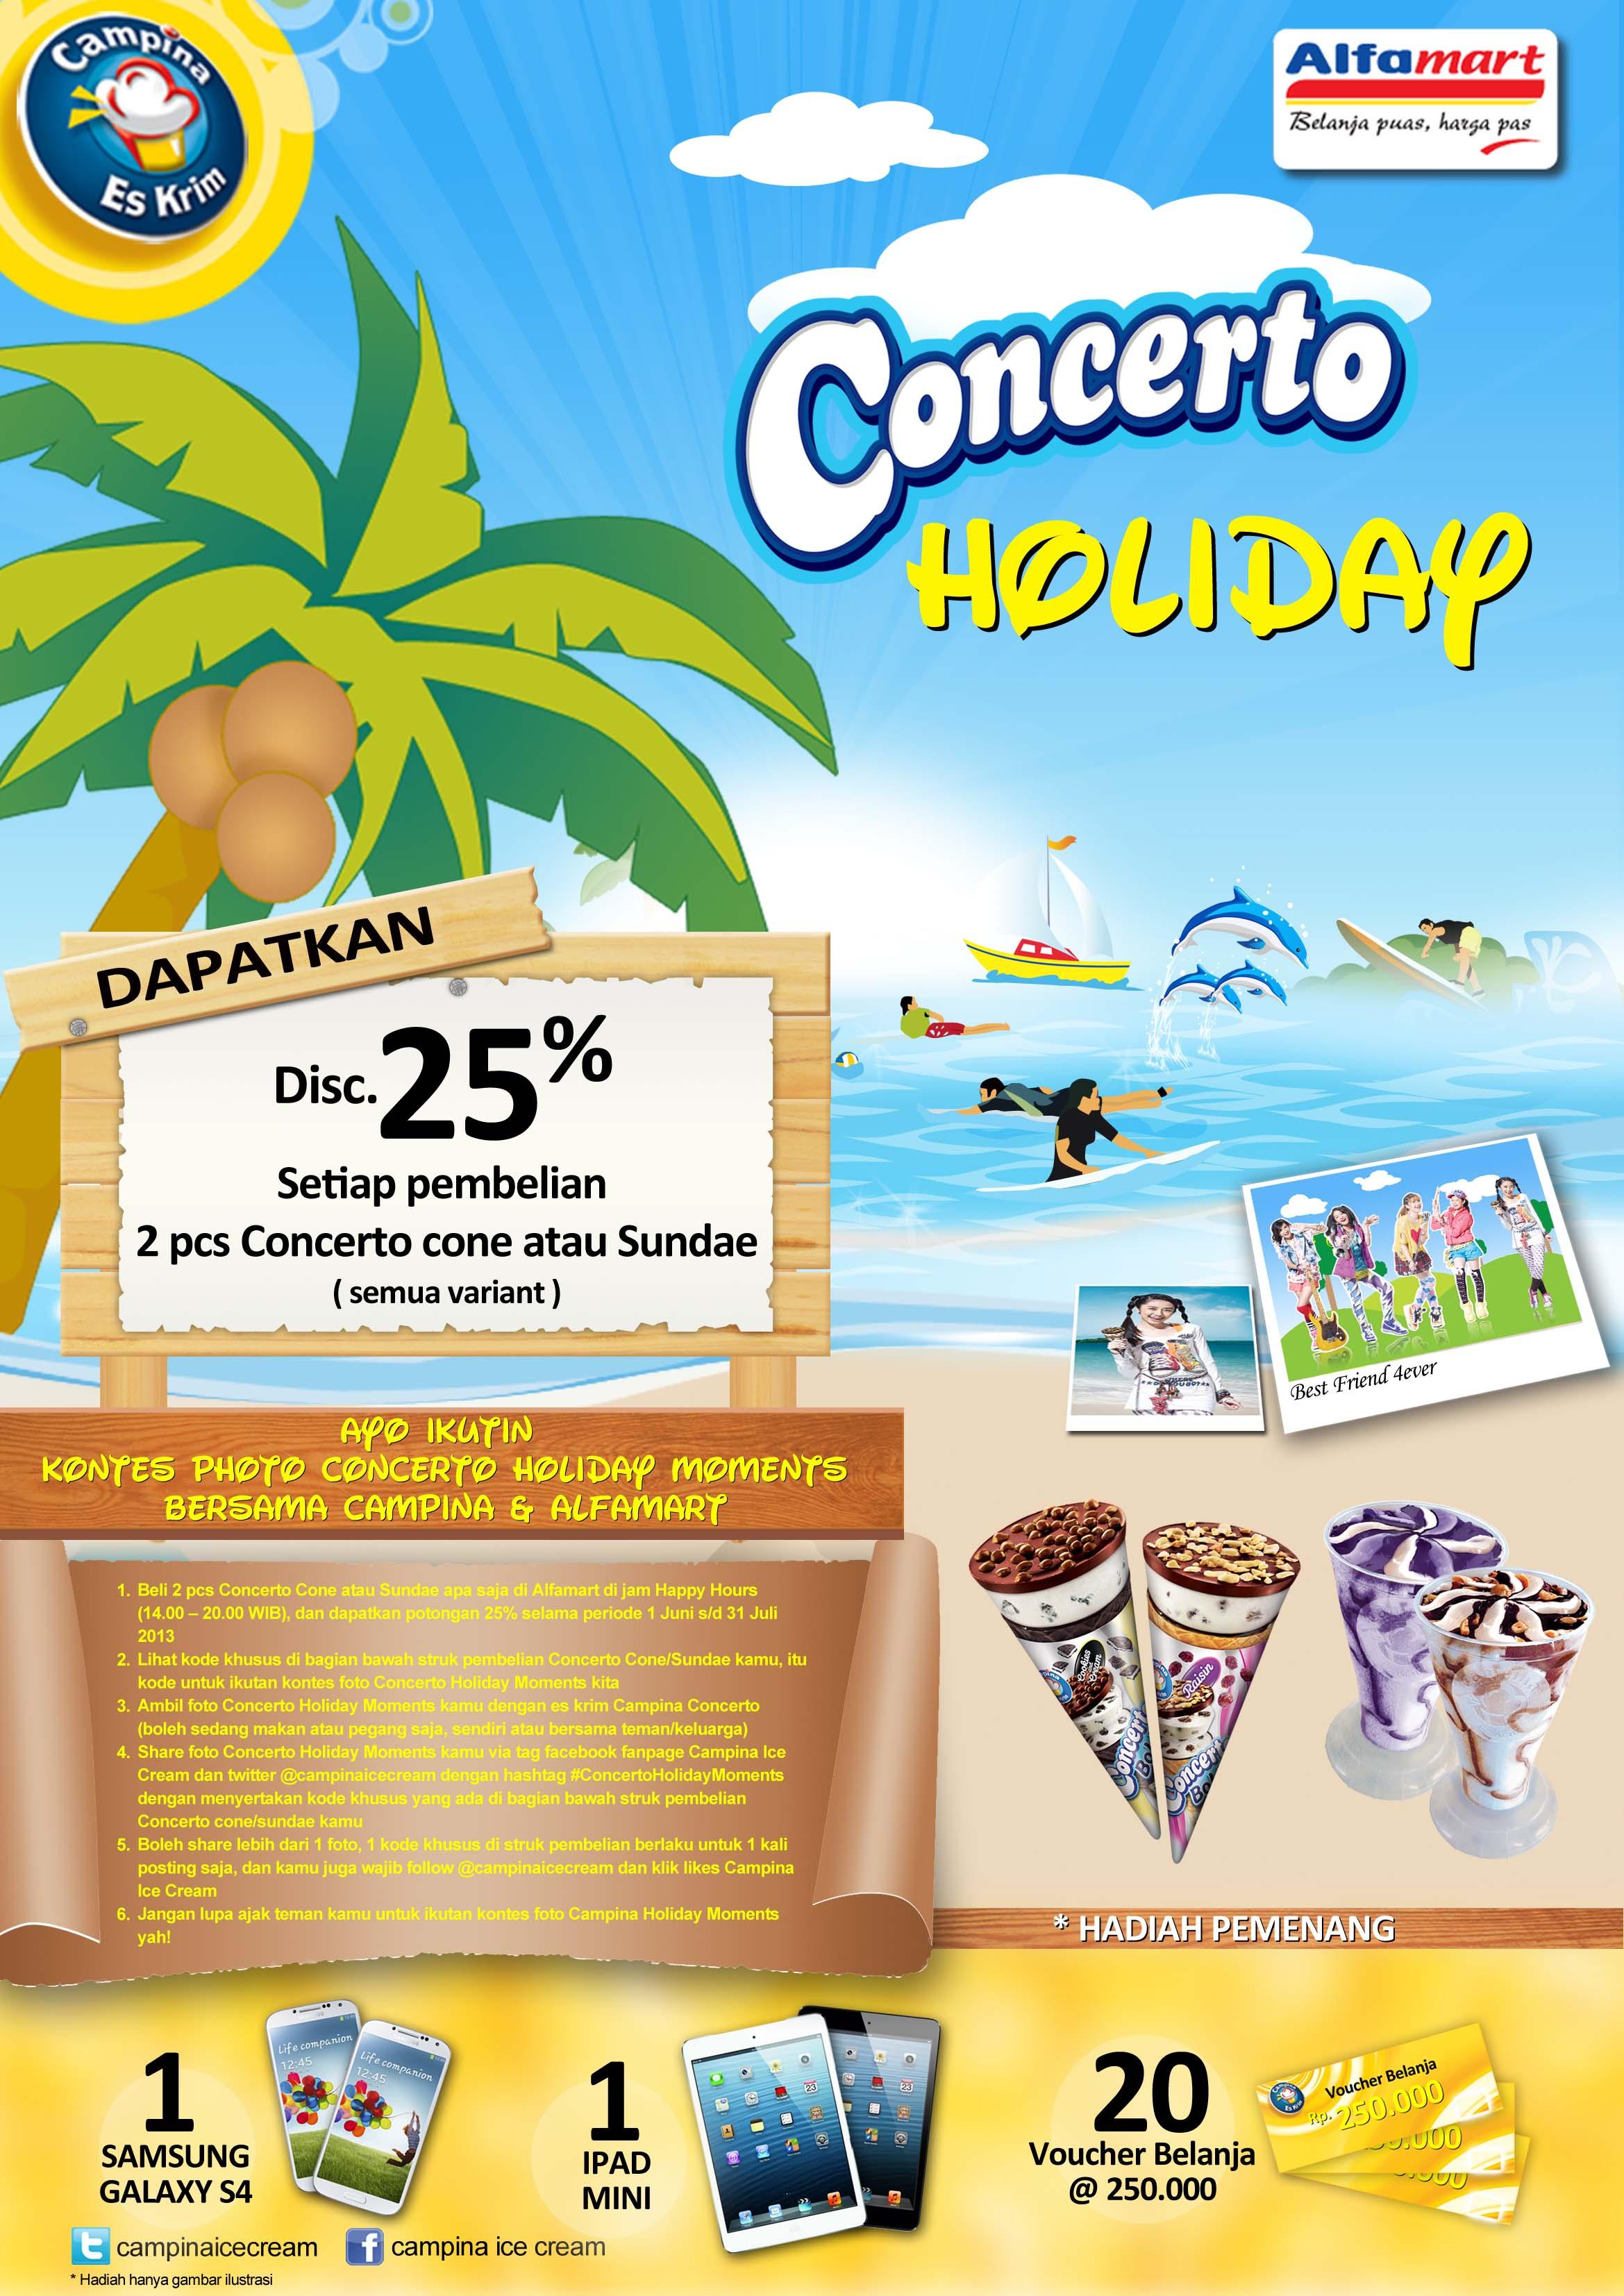 Campina Alfamart Concerto Holiday Moments Promo Campina Ice Cream